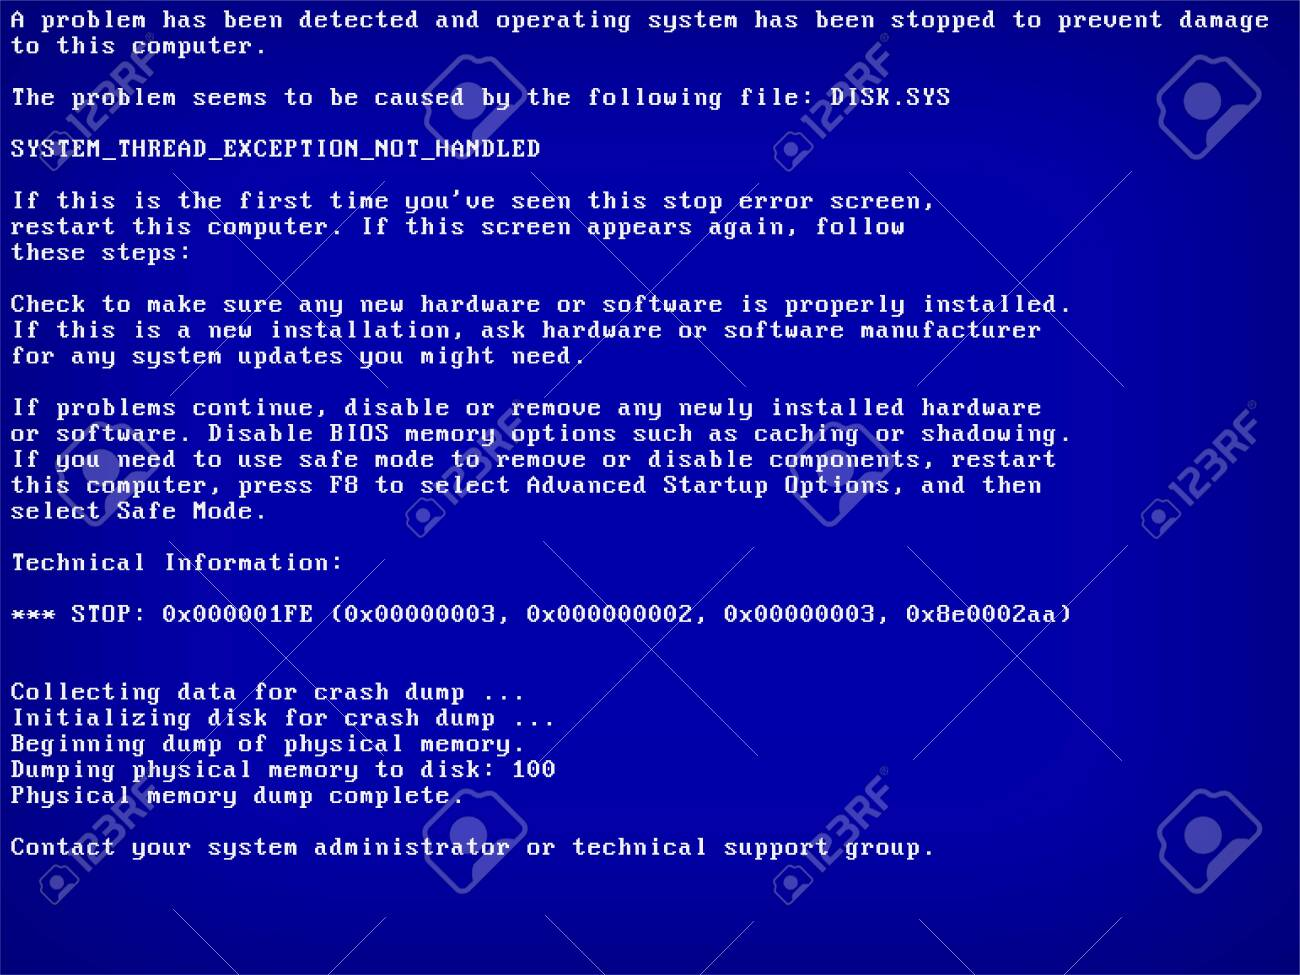 Blue screen of death BSOD. System crash error. Vector Illustration - 150401700